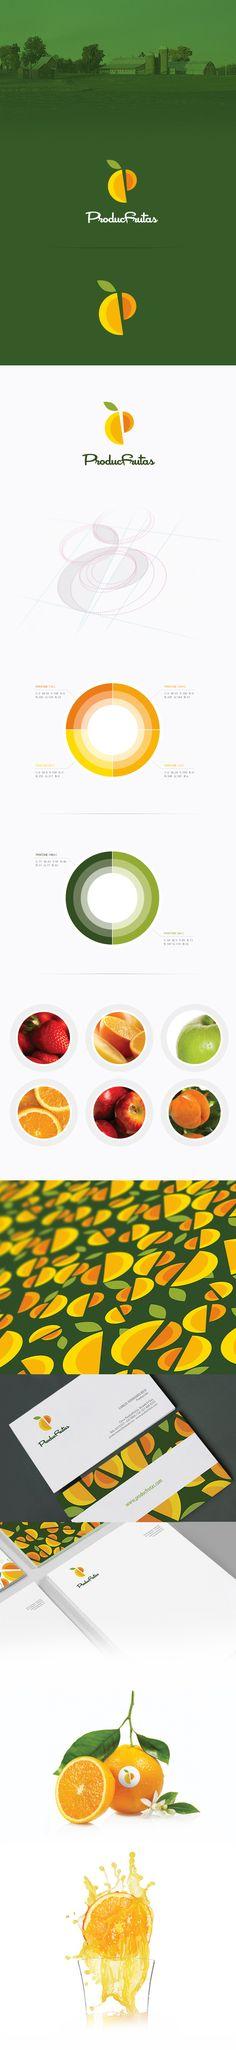 Producfrutas - Branding on Behance